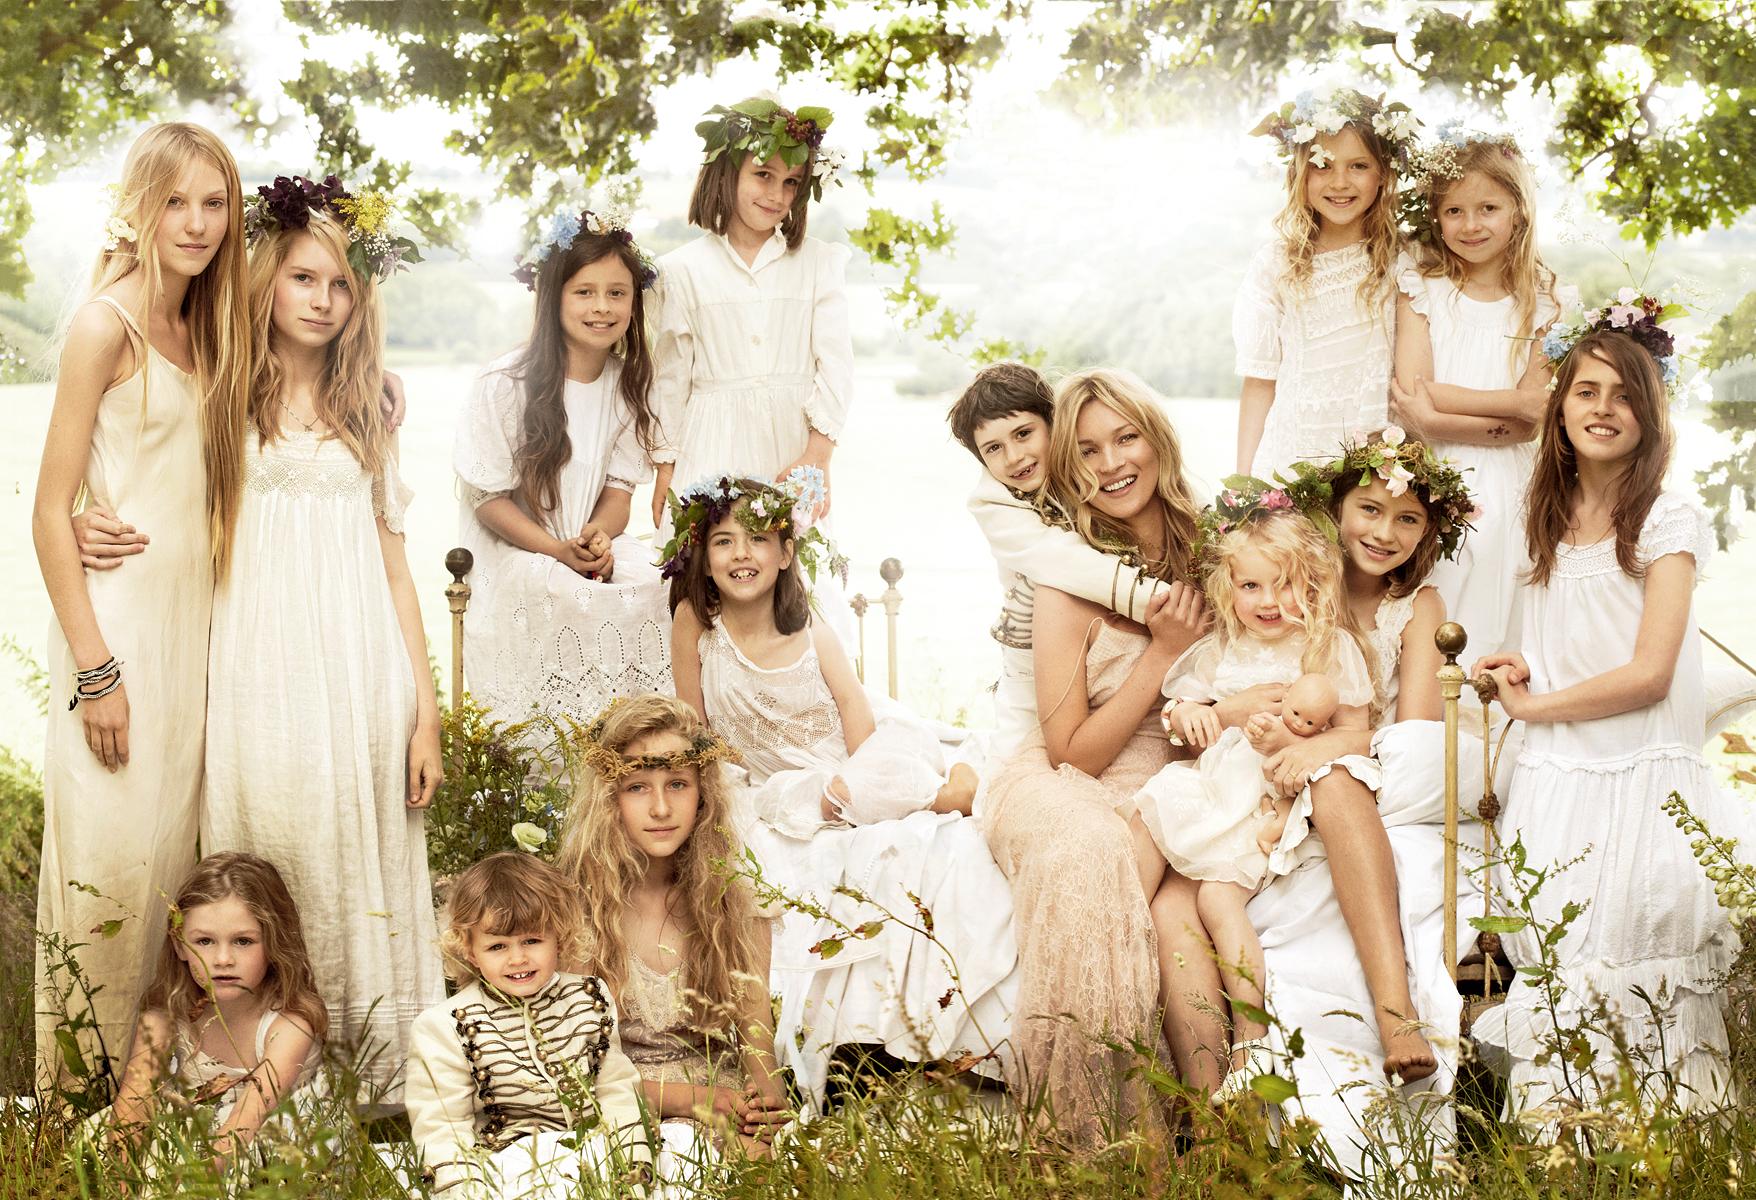 kate moss romantic wedding onewedcom